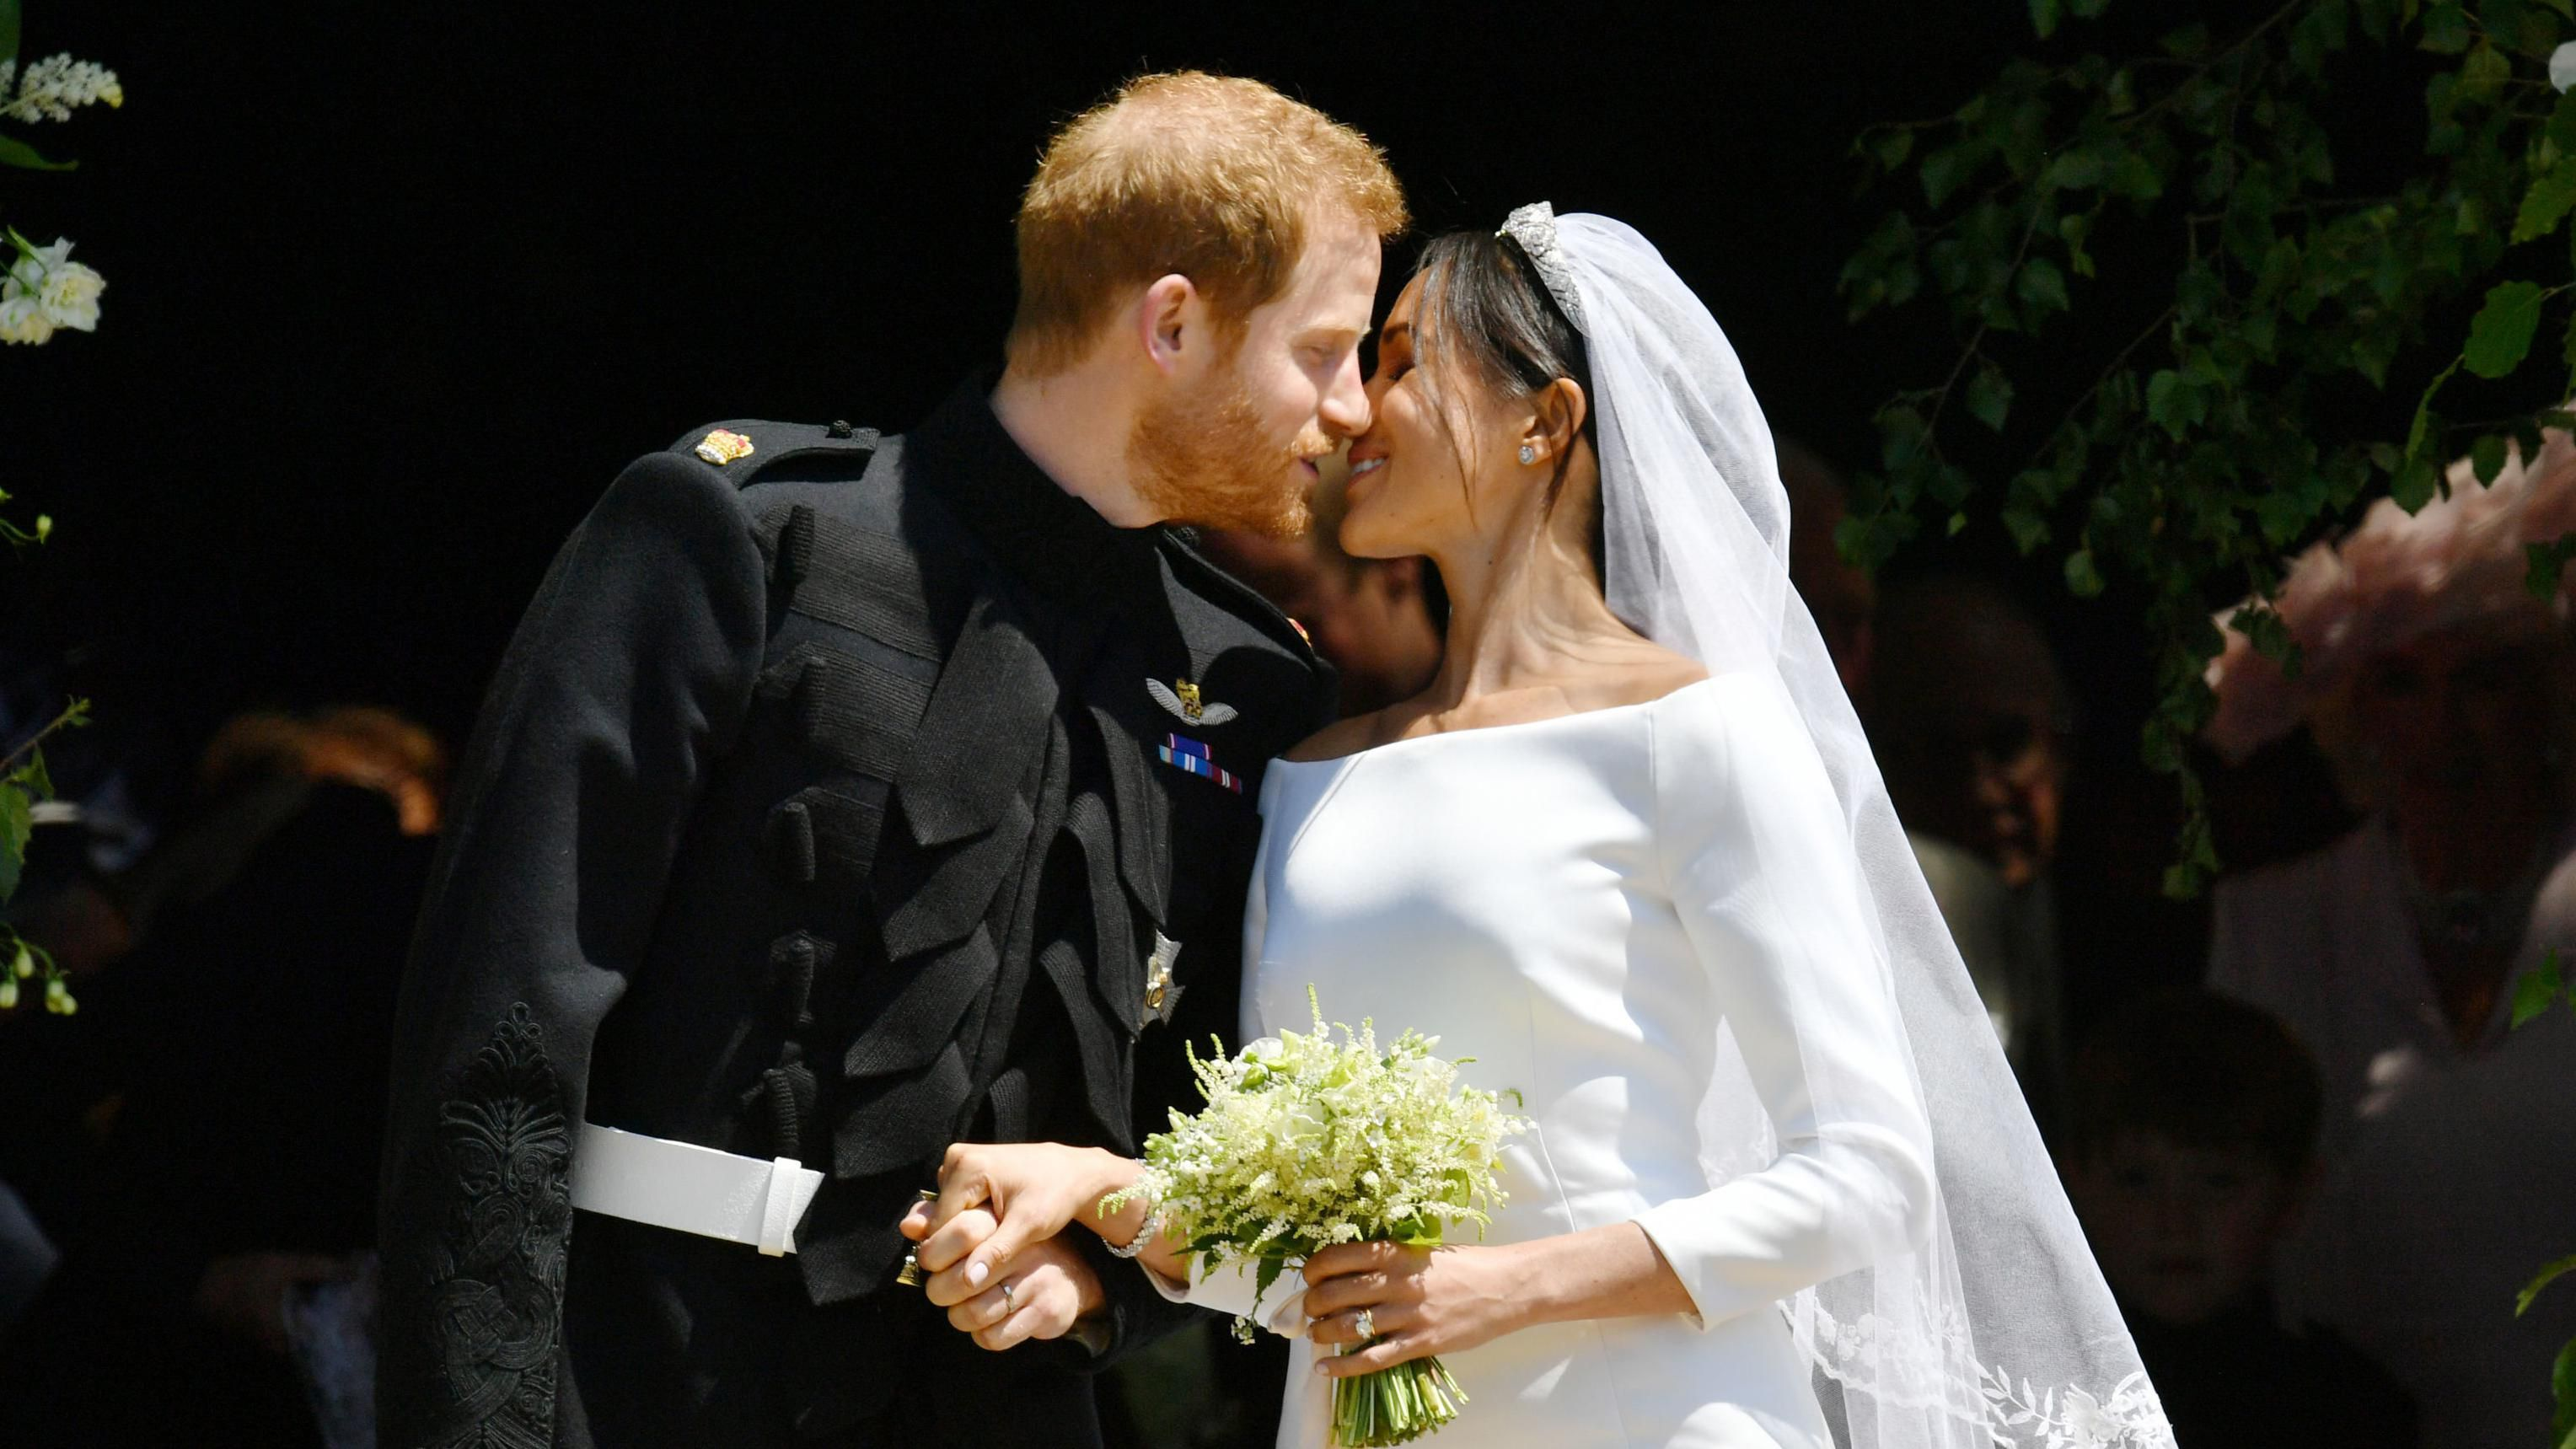 meghan markle followed this sweet royal wedding bouquet tradition sweet royal wedding bouquet tradition